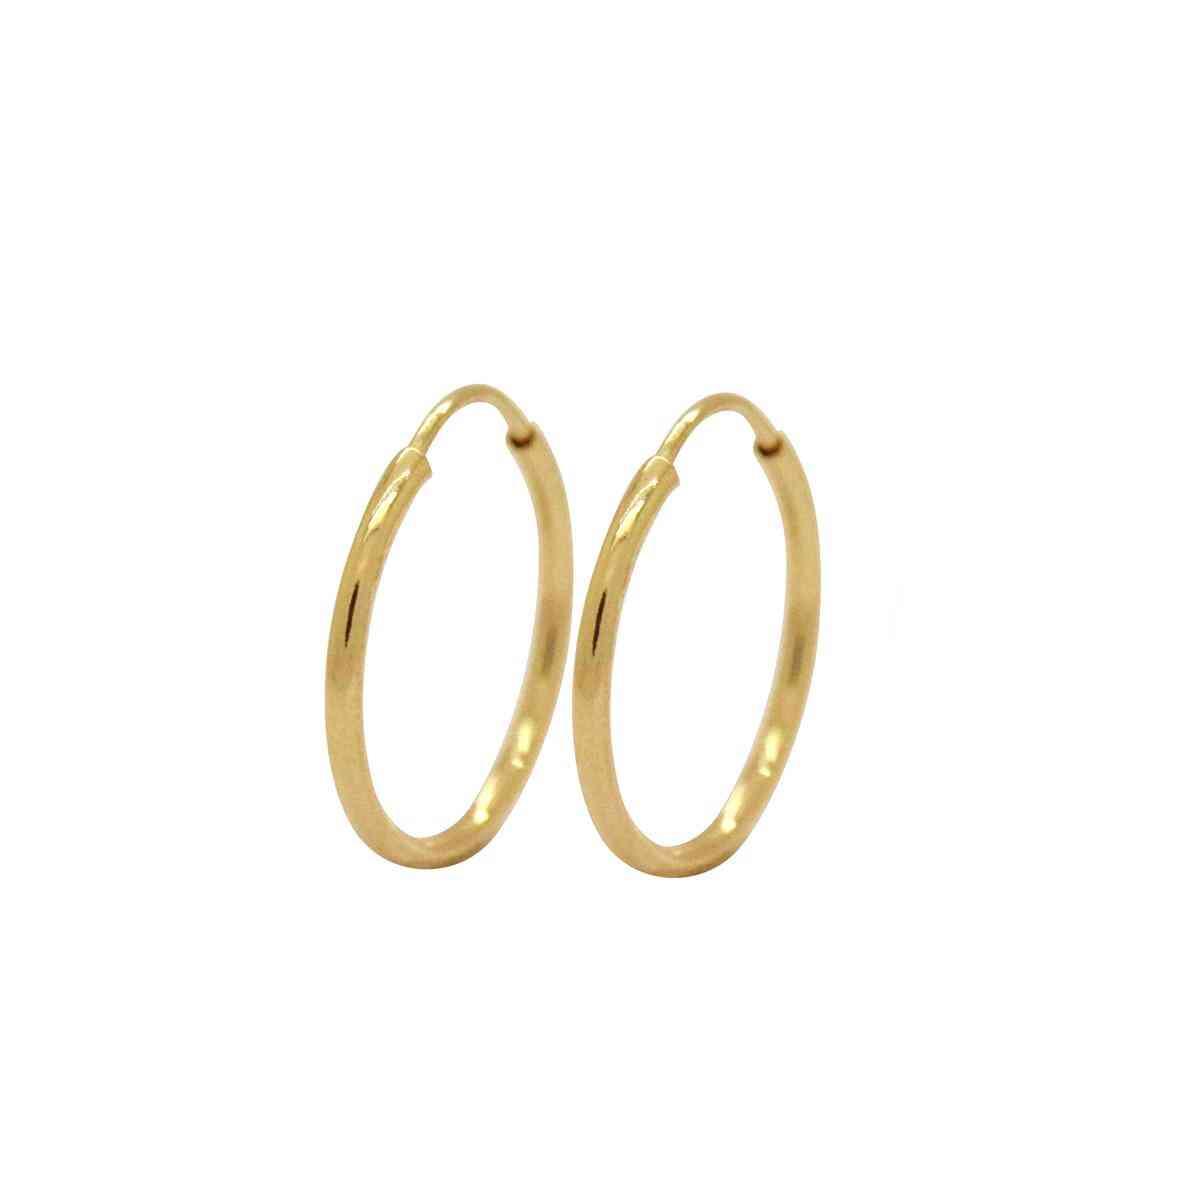 Brinco Ouro 18k Argola Tradicional Lisa 13 mm